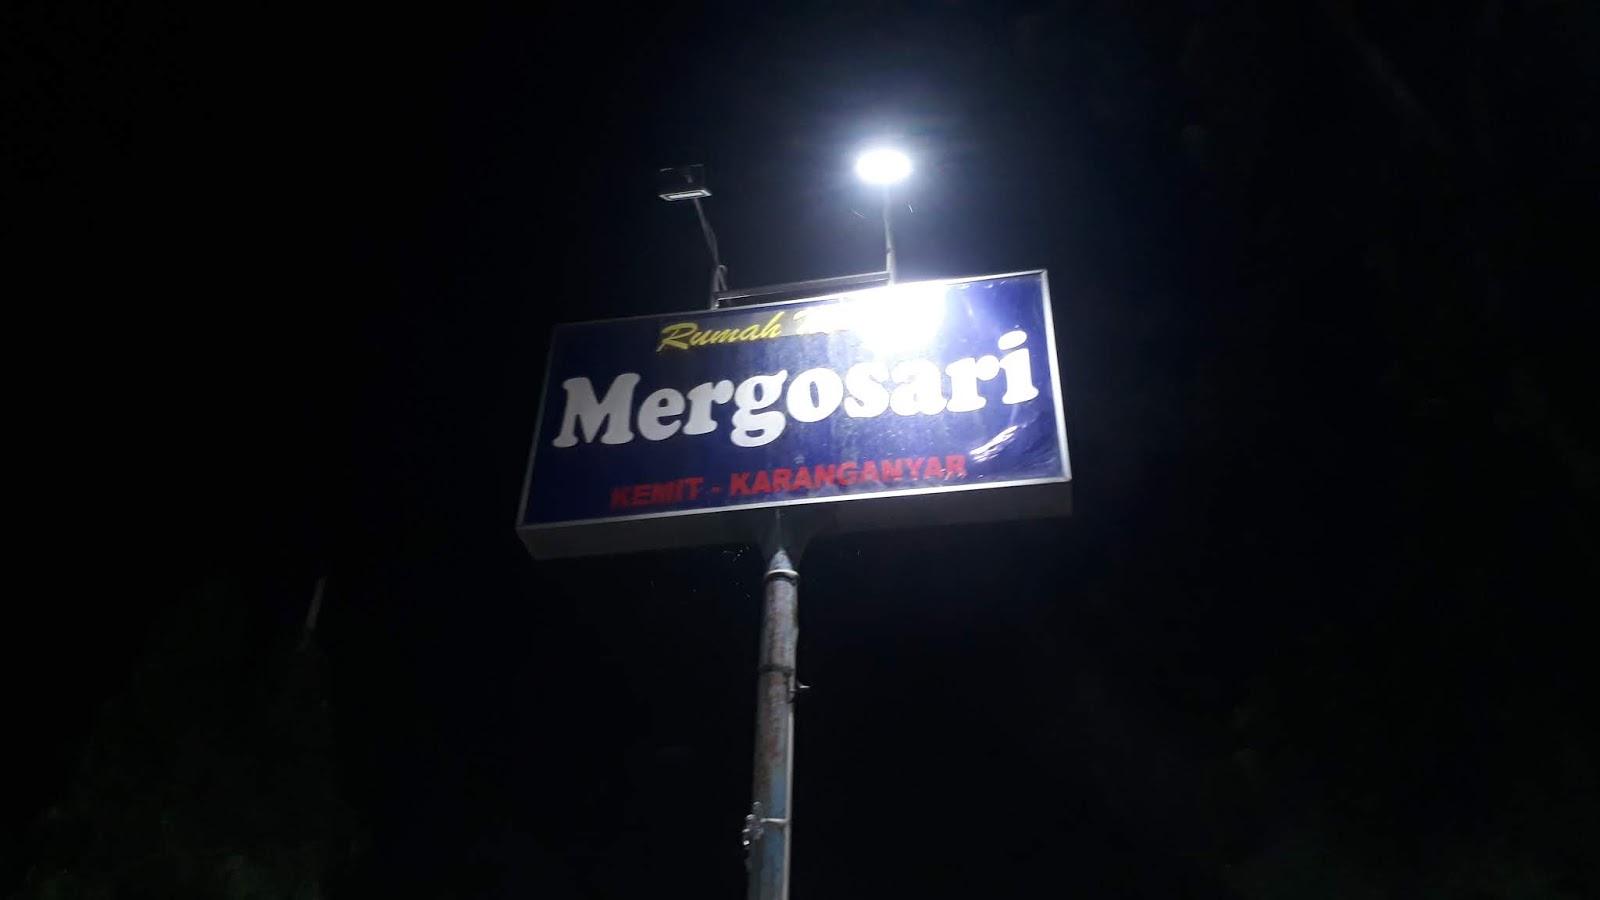 RM Mergosari